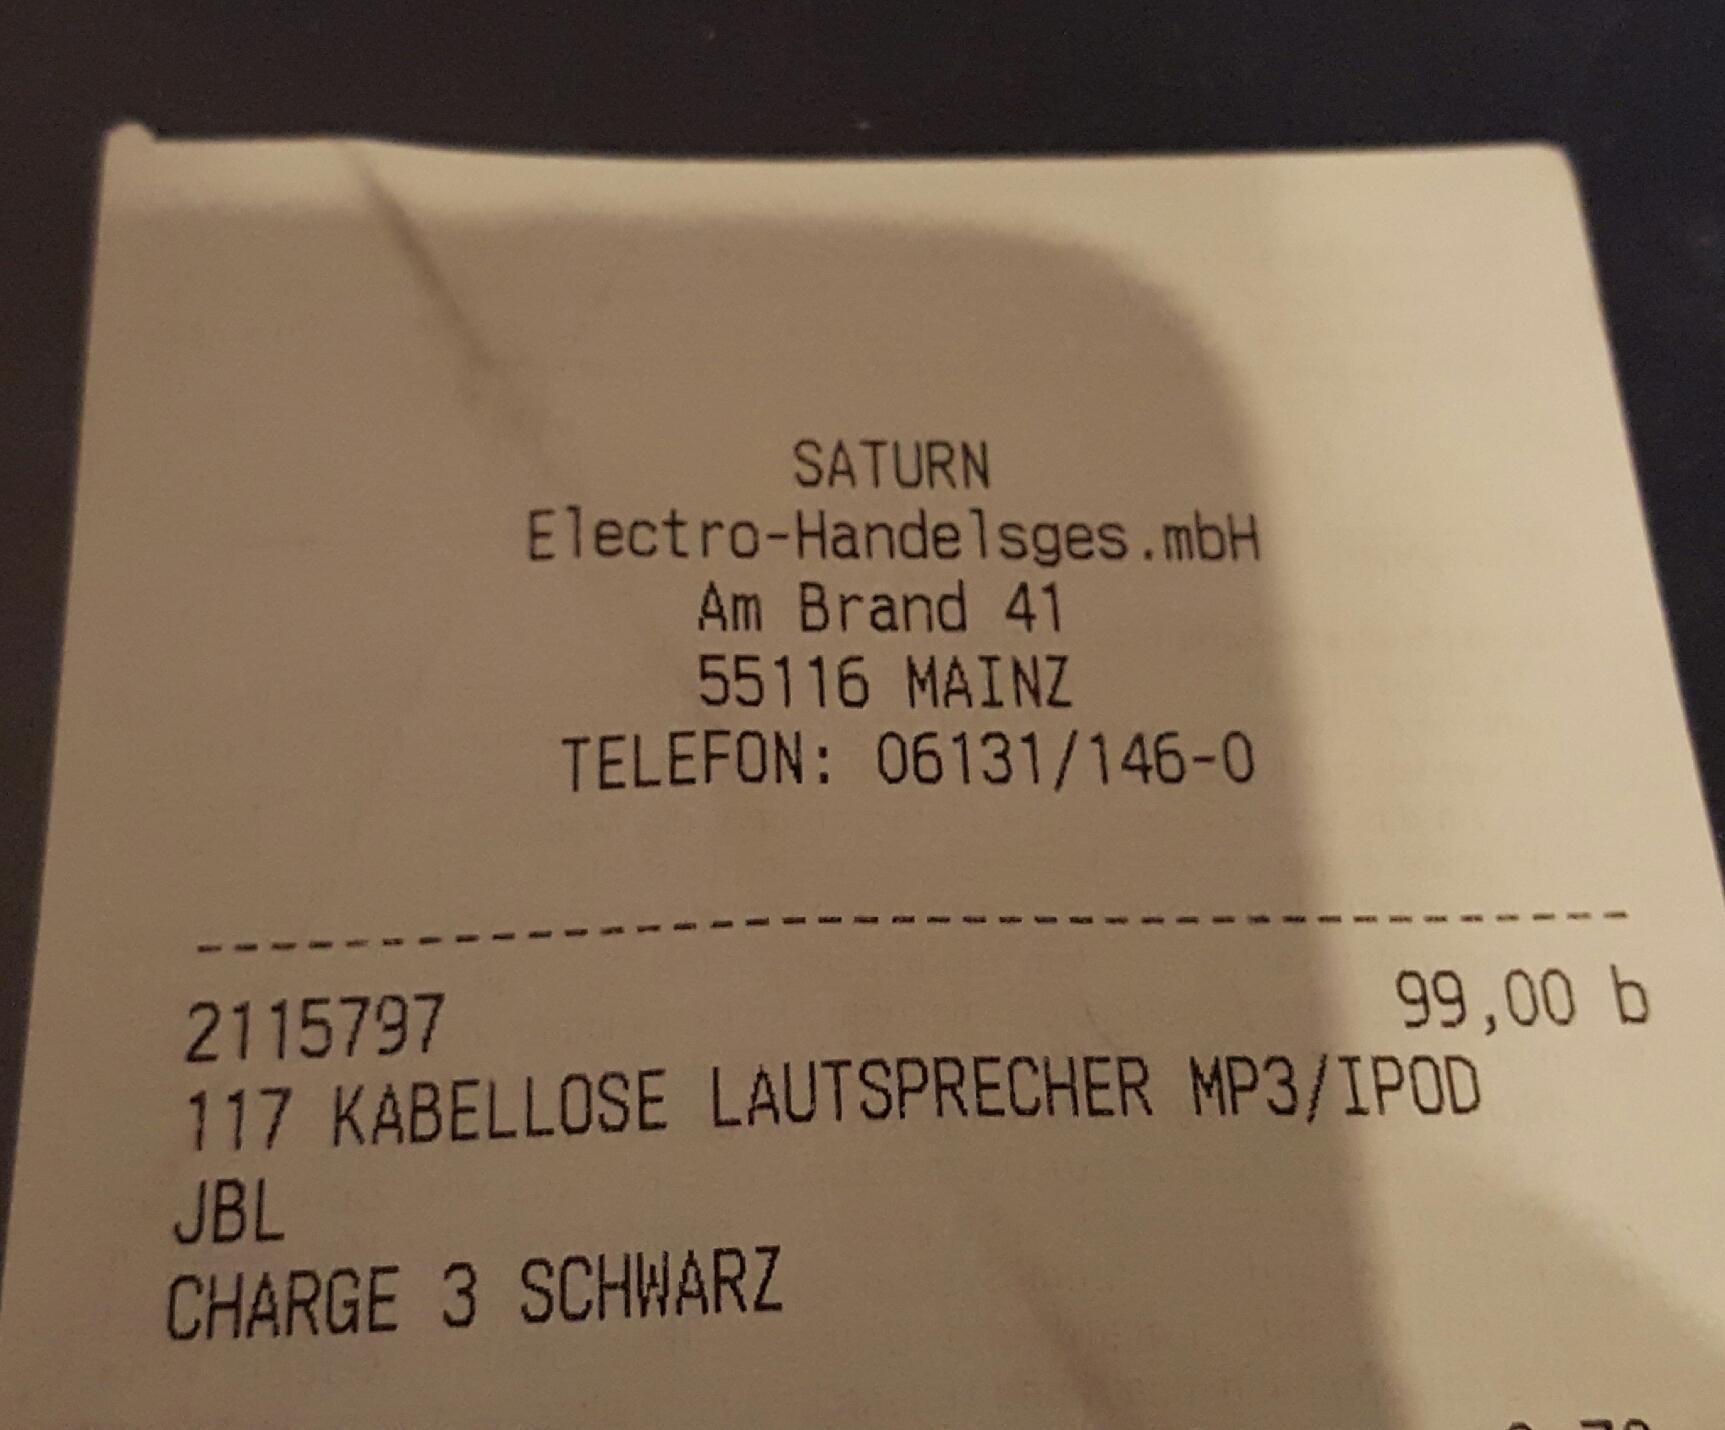 JBL Charge 3 im Saturn Mainz